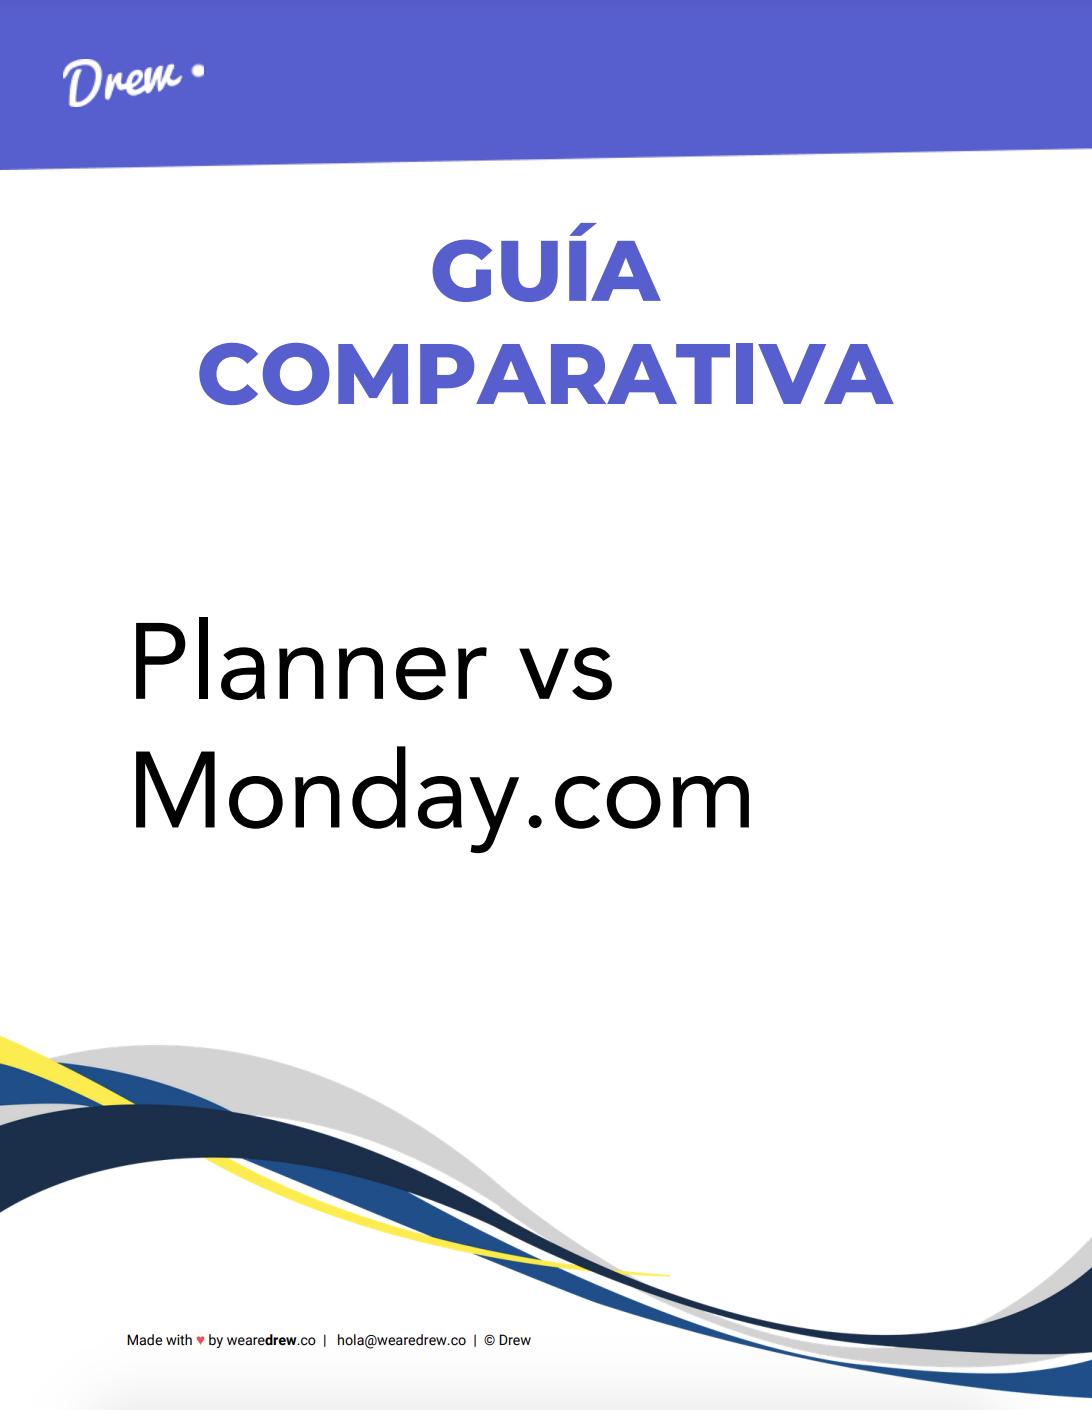 MS Planner vs monday.com